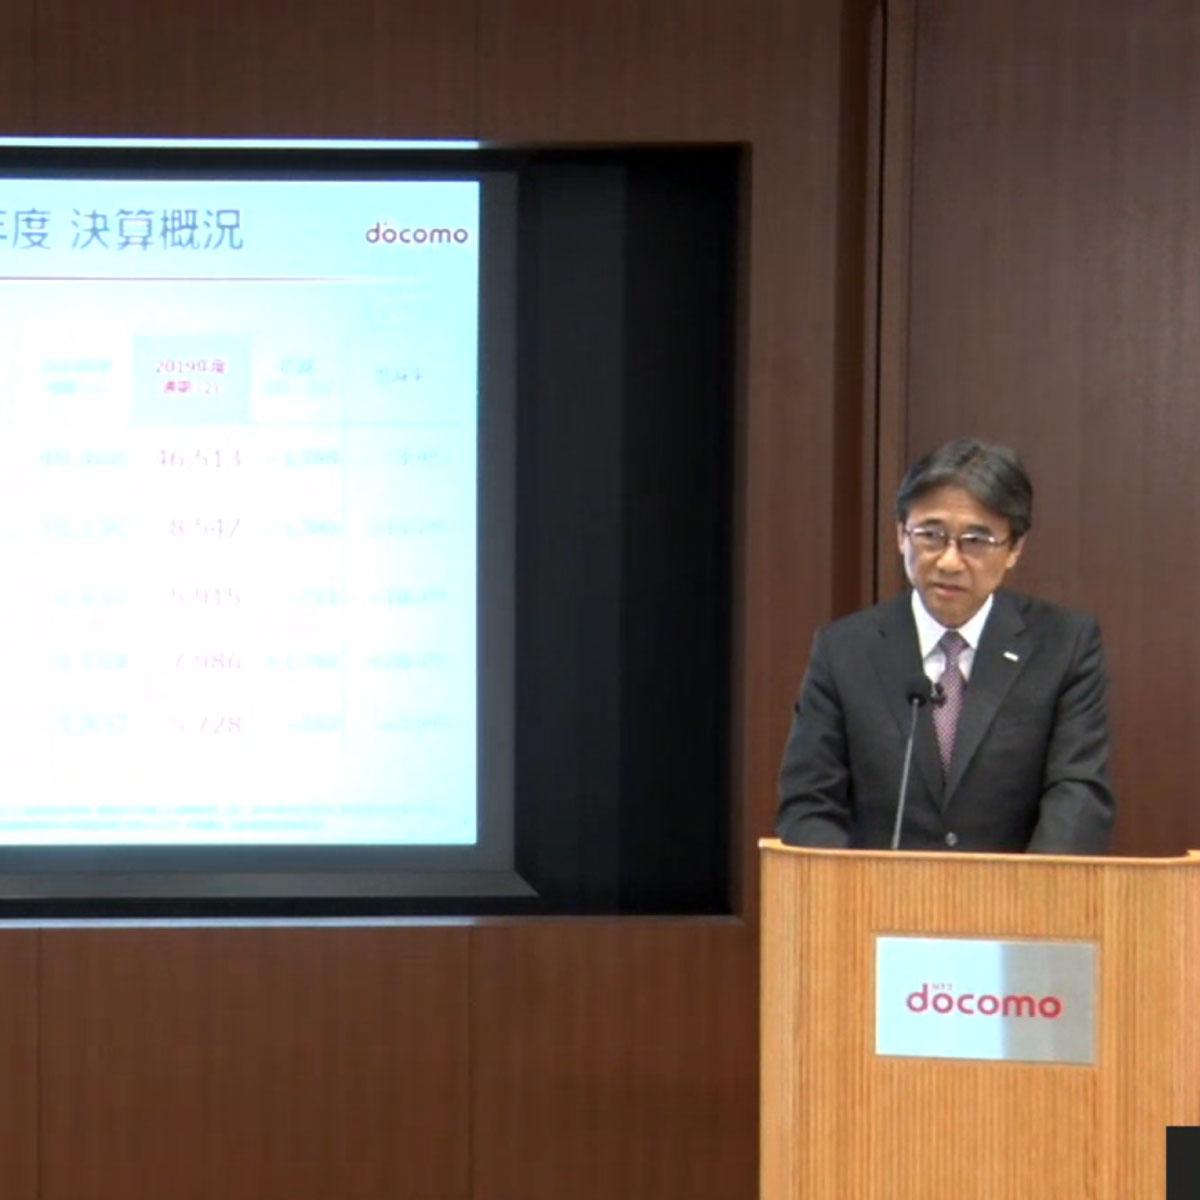 NTTドコモが新型コロナウイルスの影響を発表。5Gが遅れる可能性も